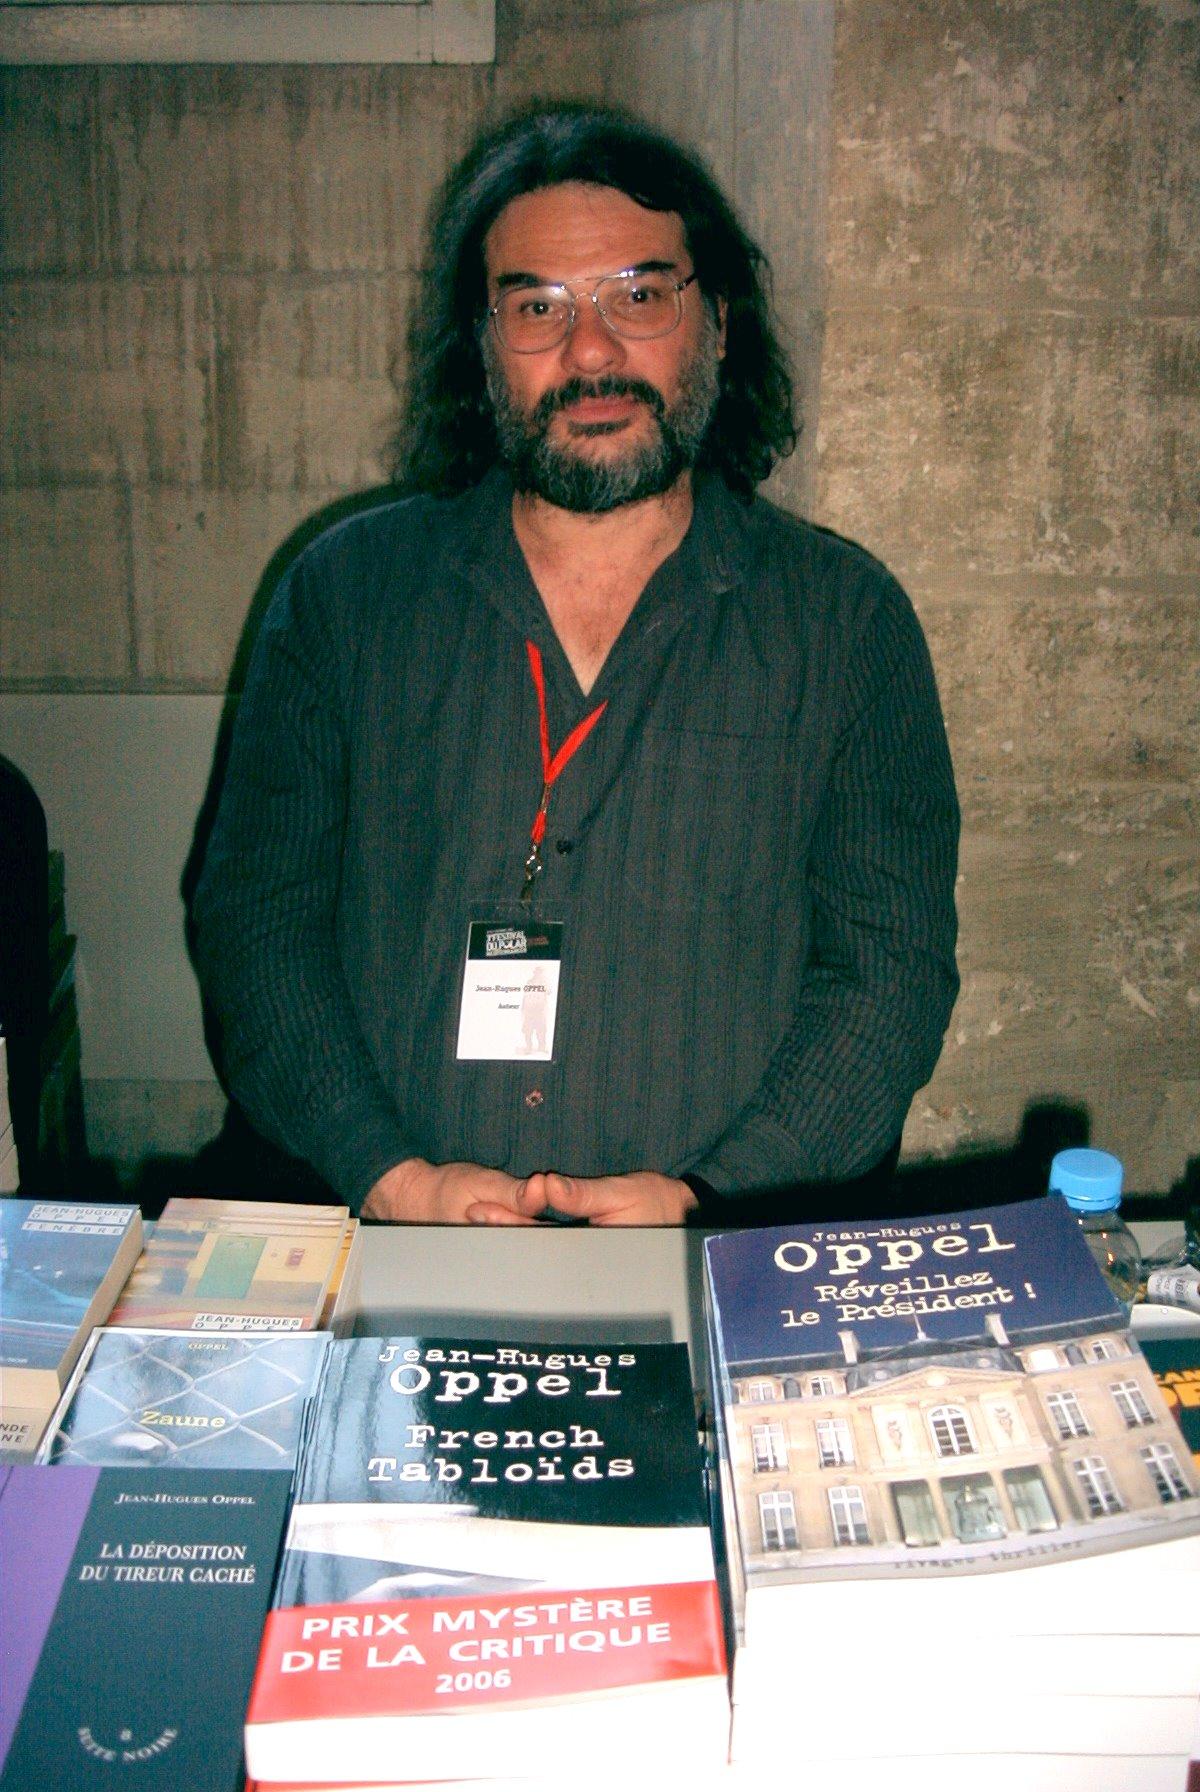 Jean Hugues Oppel